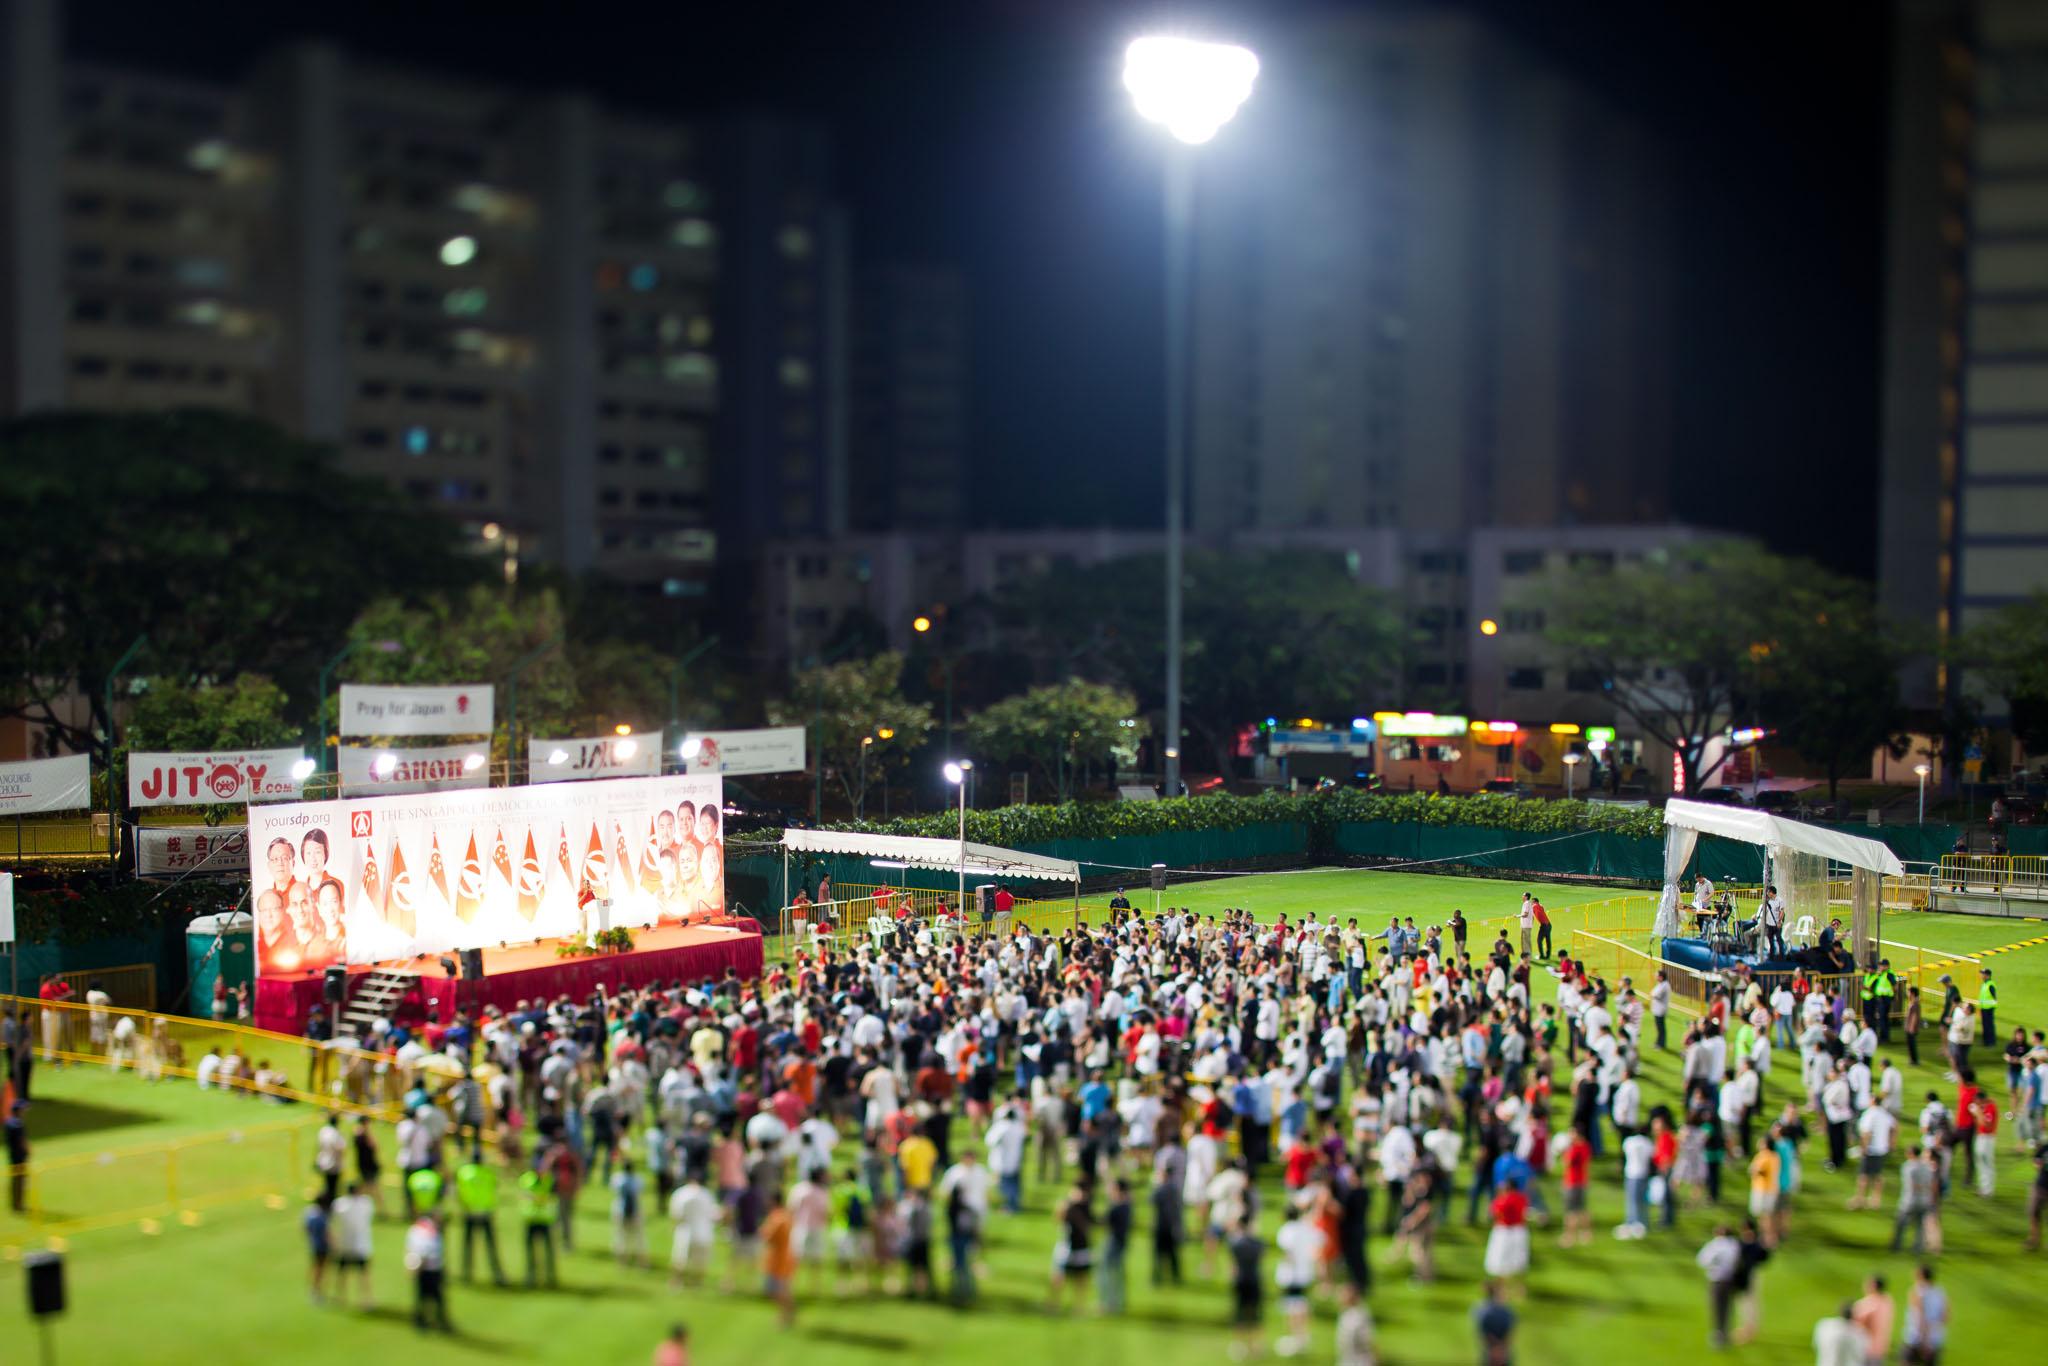 singapore-commercial-photographer-editorial-documentary-tiltshift-singaplural-zakaria-zainal-03.jpg